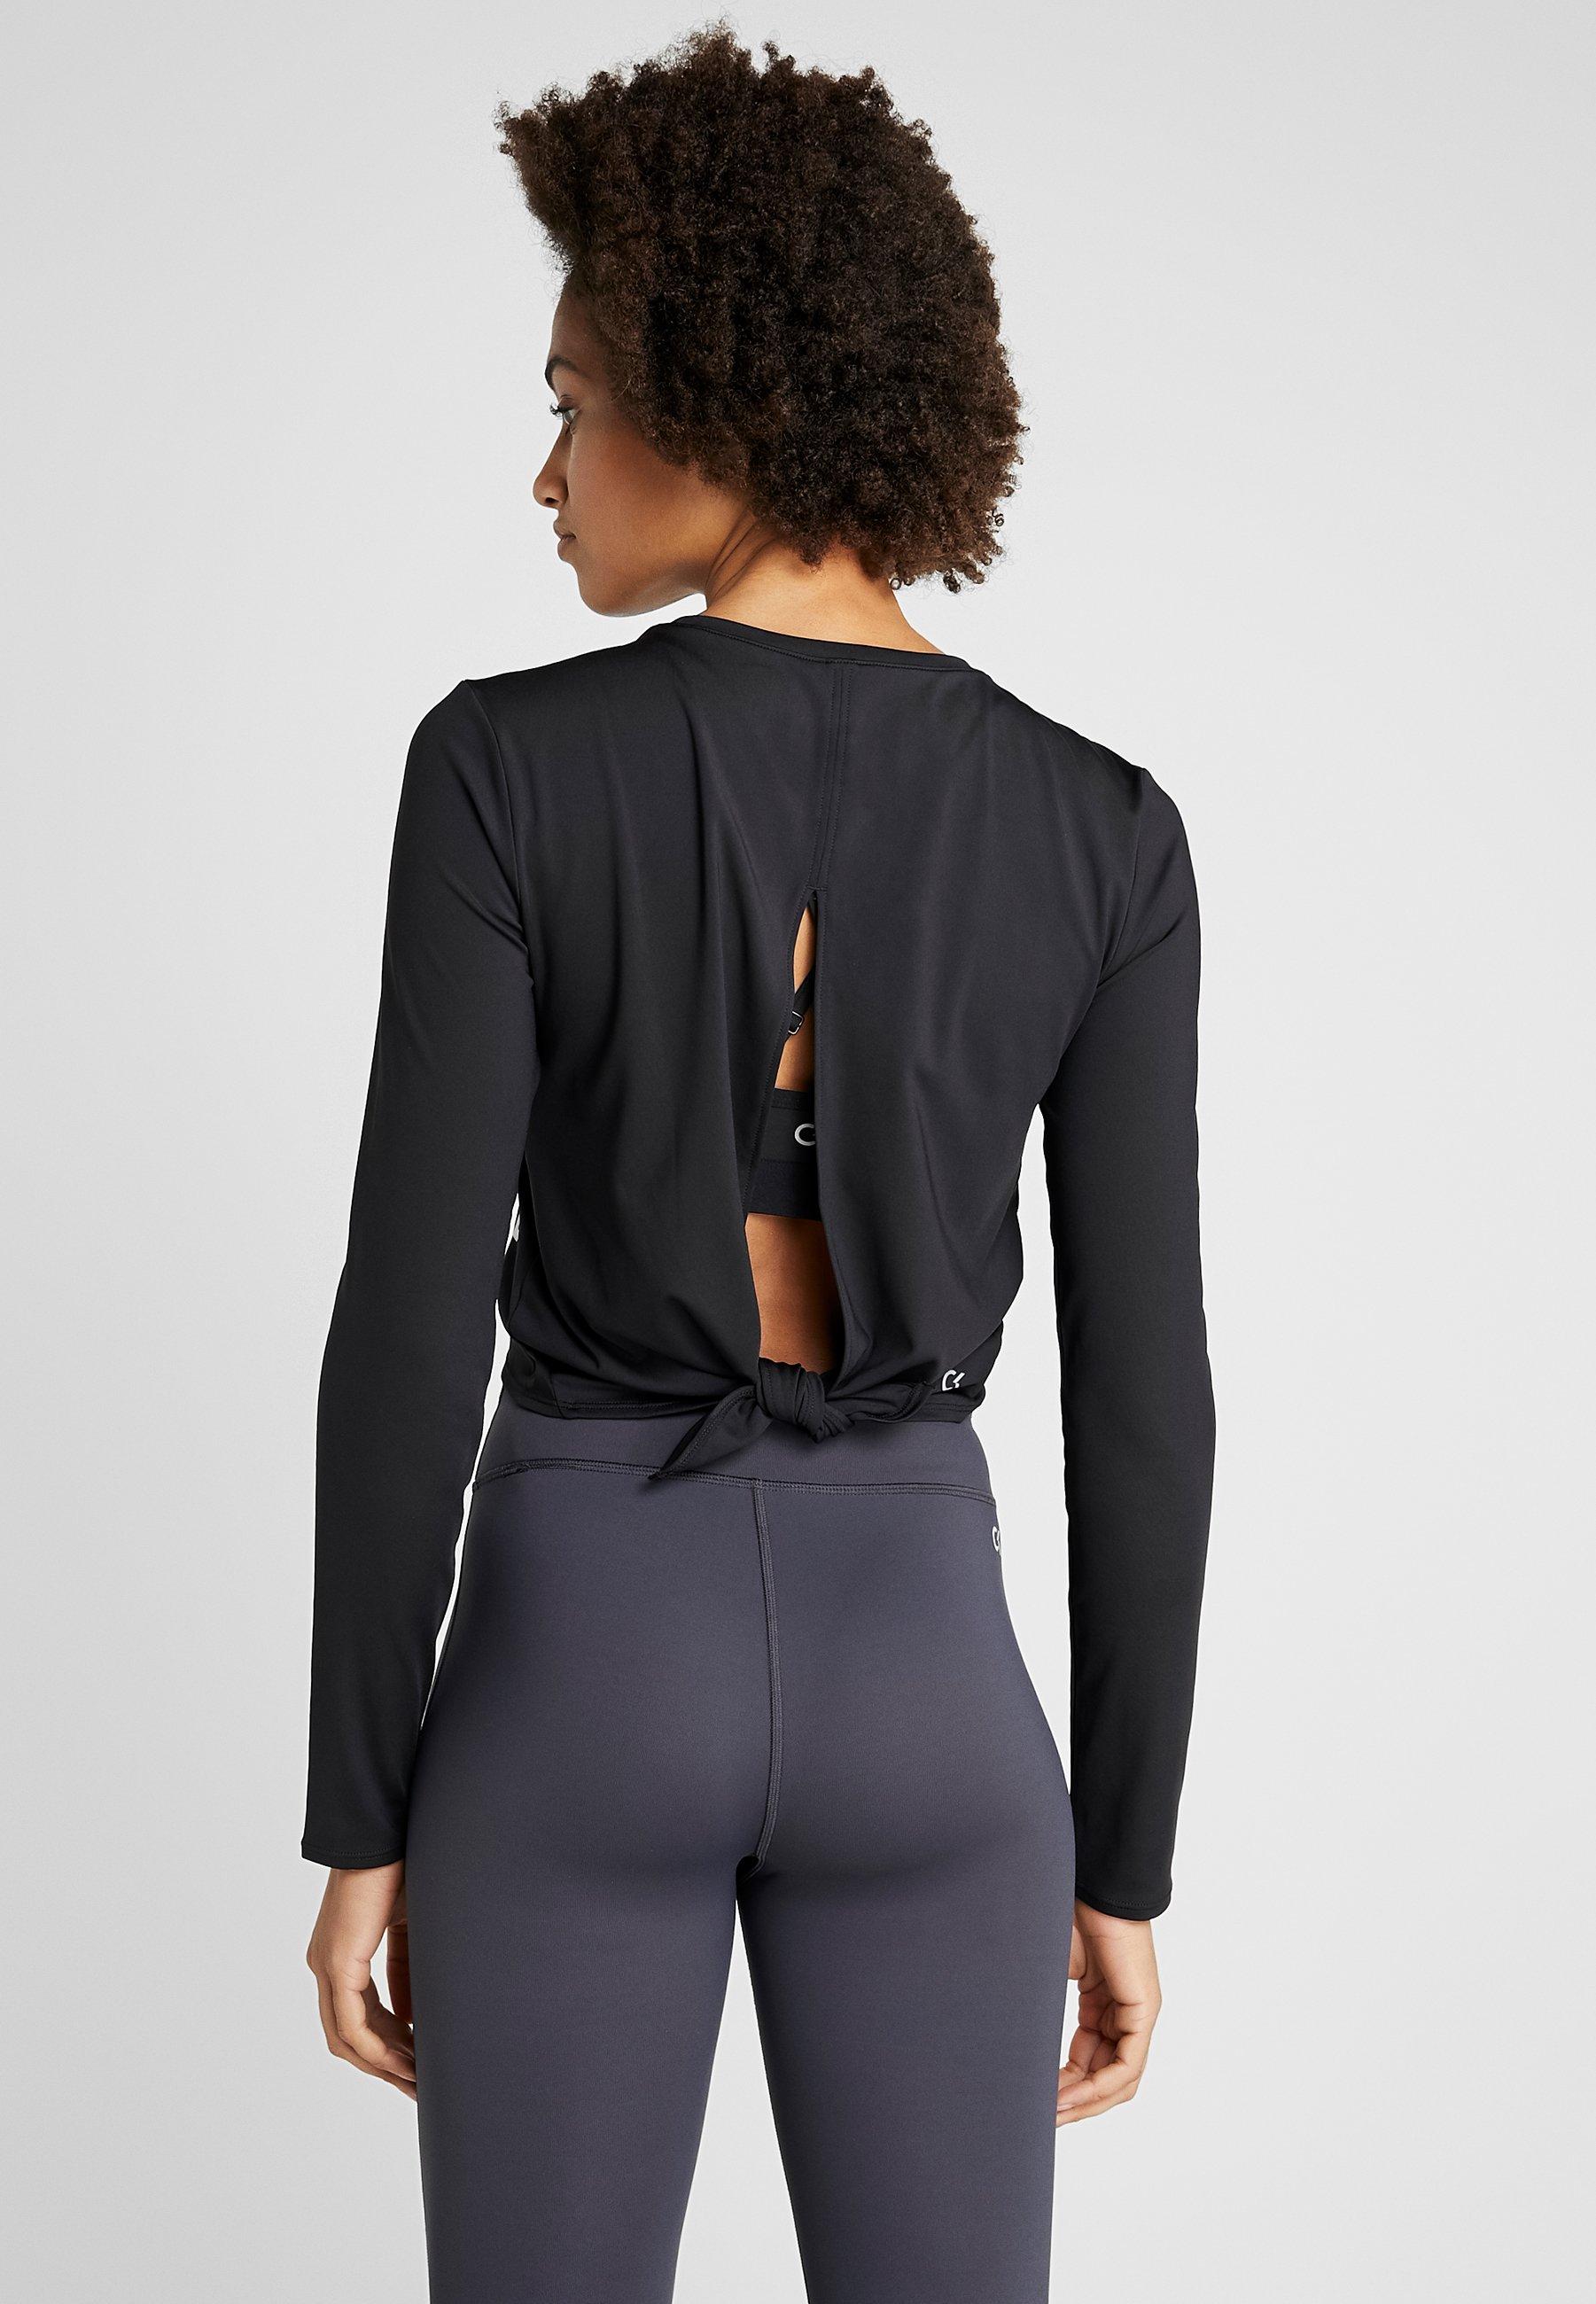 Calvin Klein Performance Long Sleeve - Sports Shirt Black